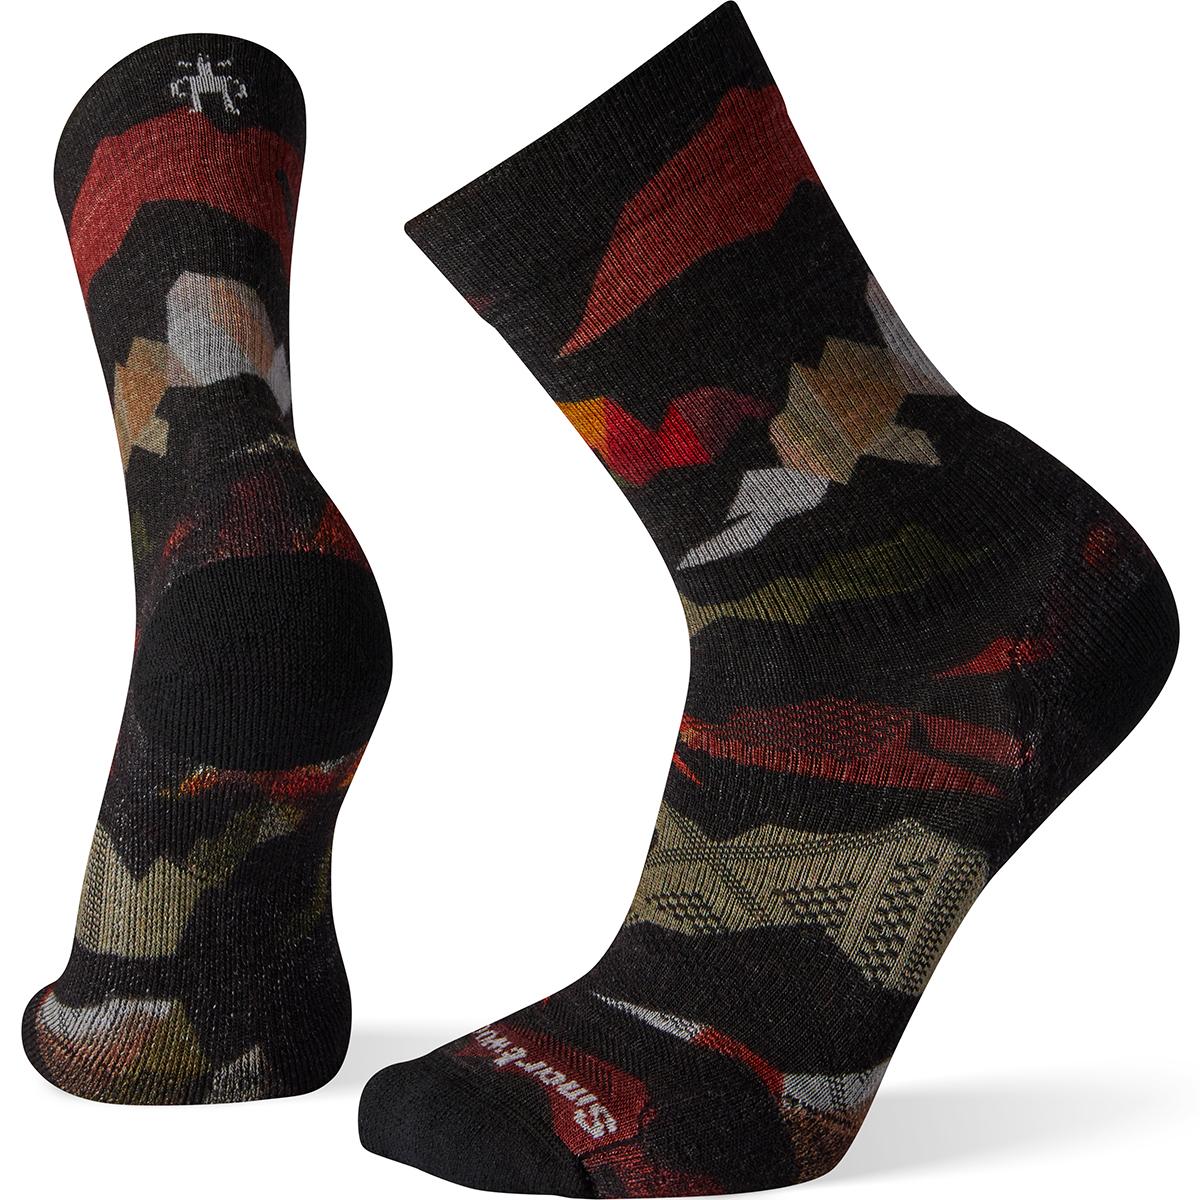 Smartwool Men's Phd Outdoor Light Mountain Camo Crew Socks - Black, XL